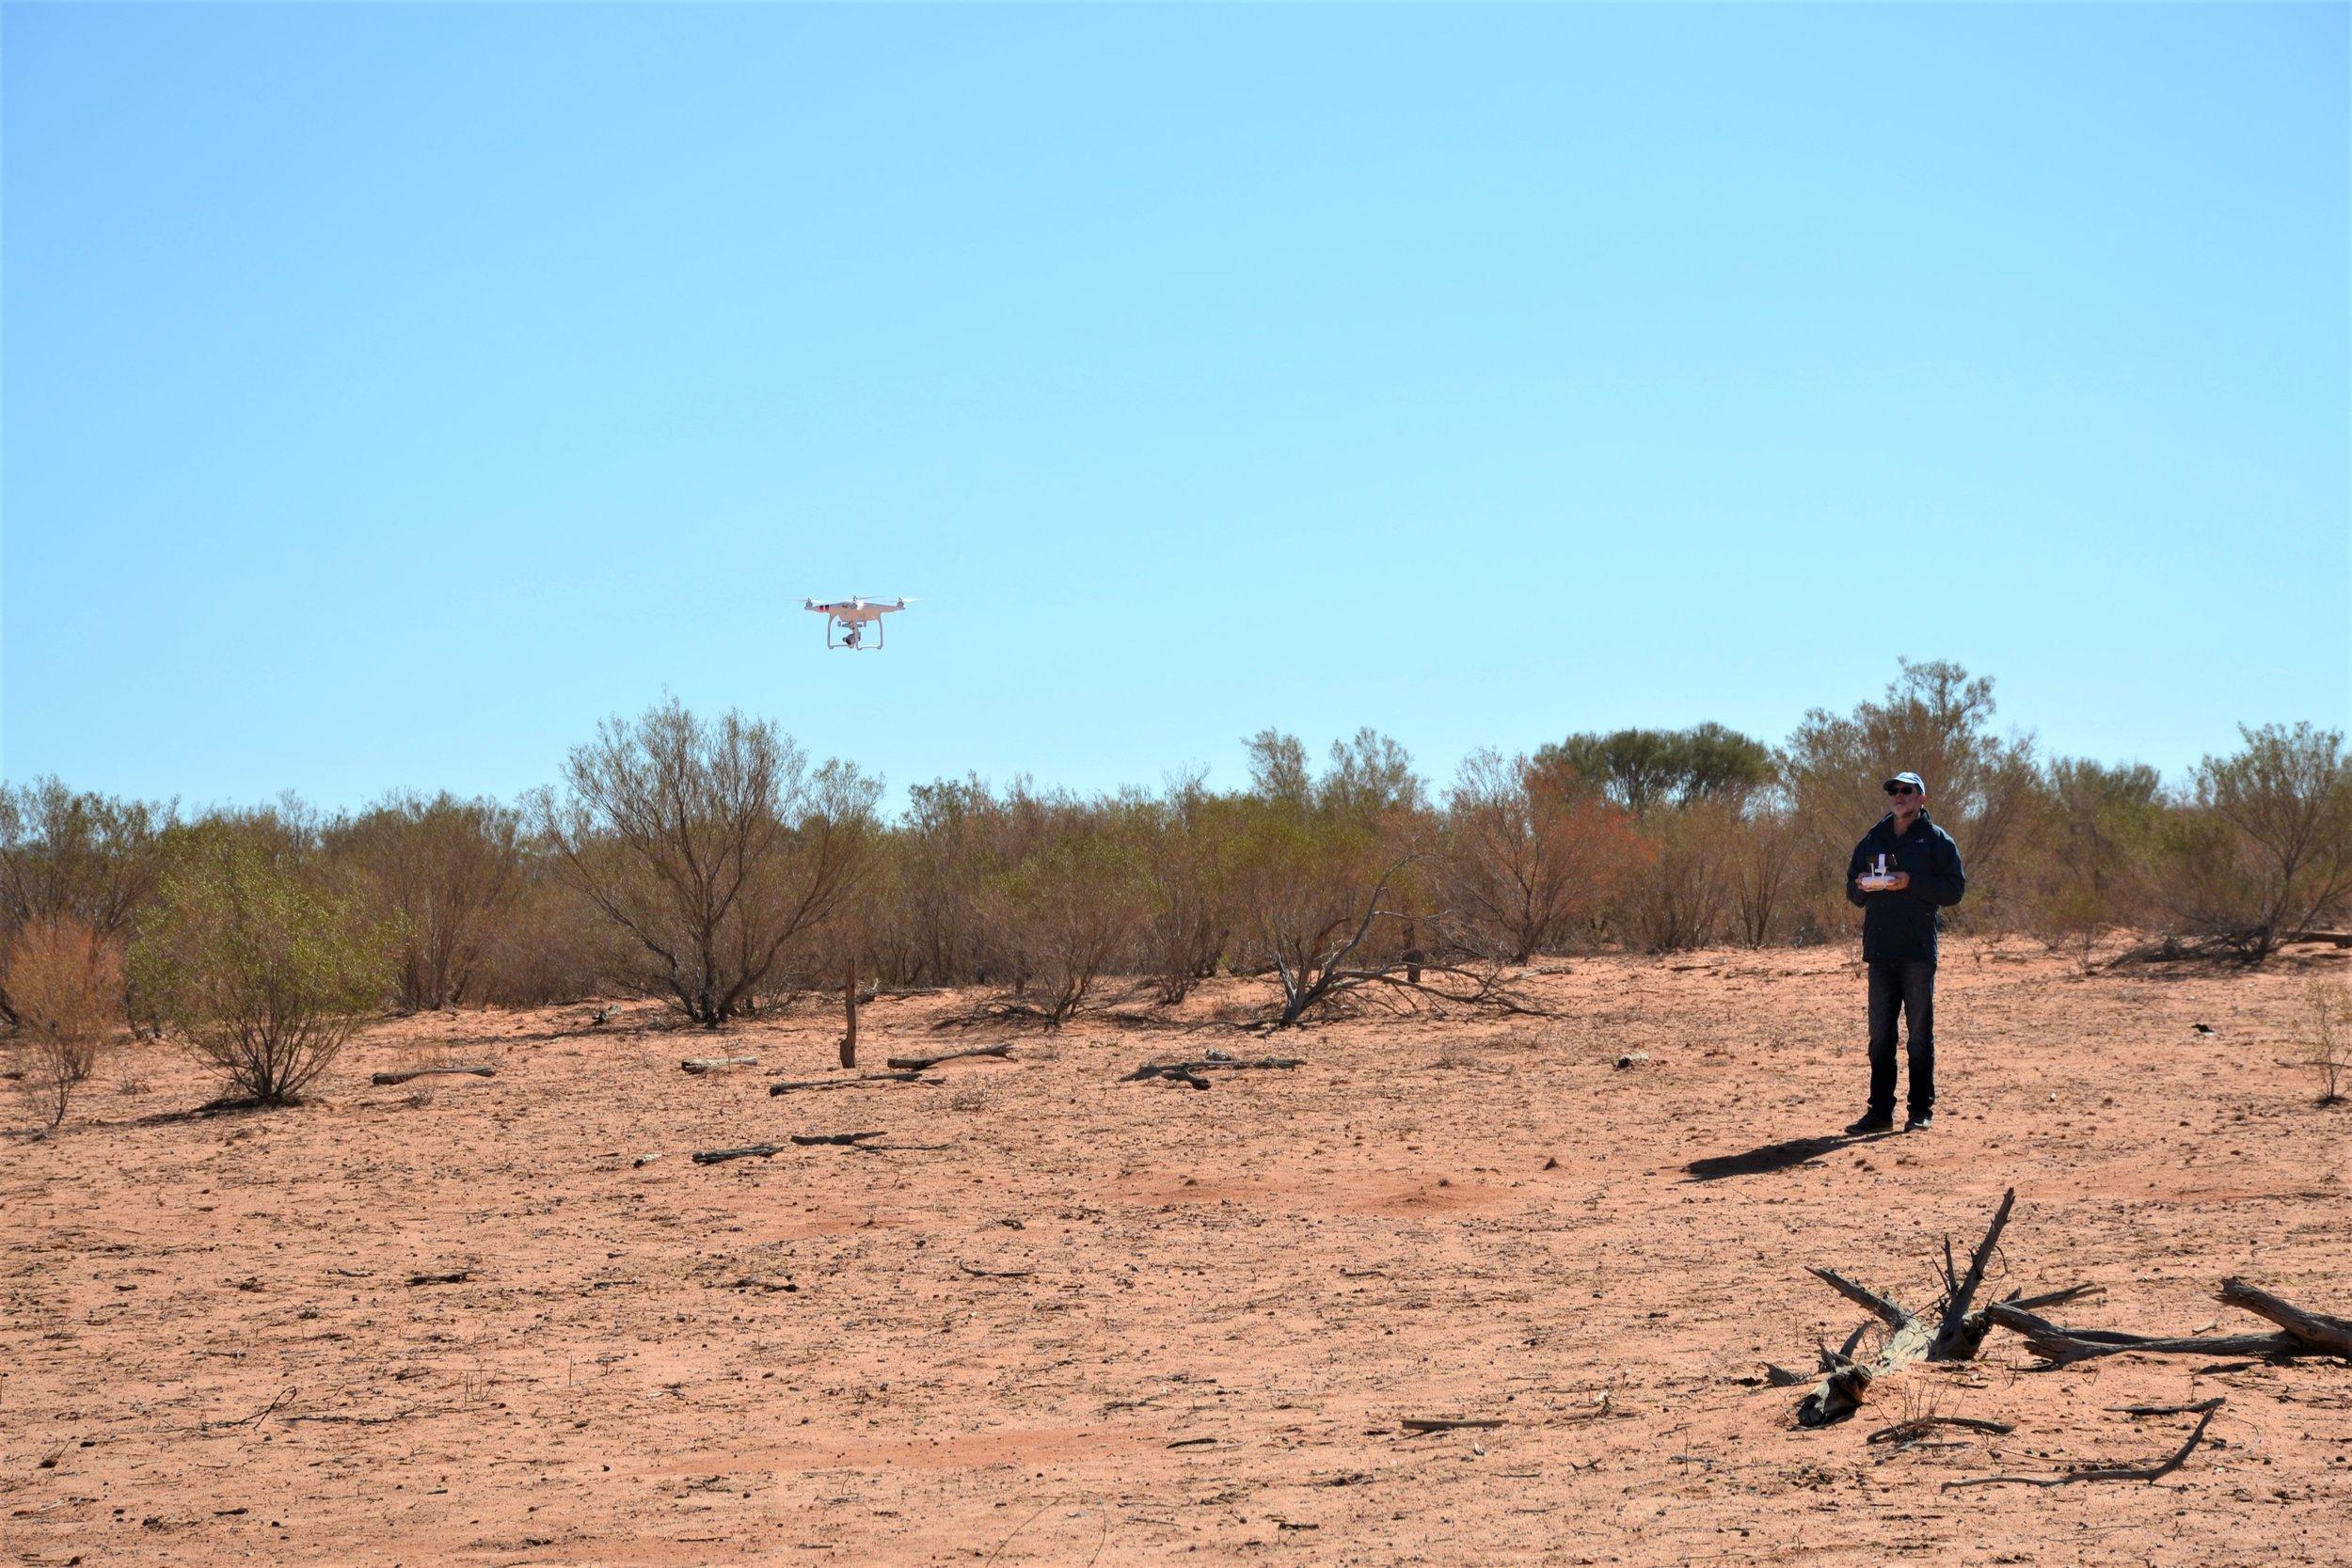 059 David & drone at woolshed.JPG